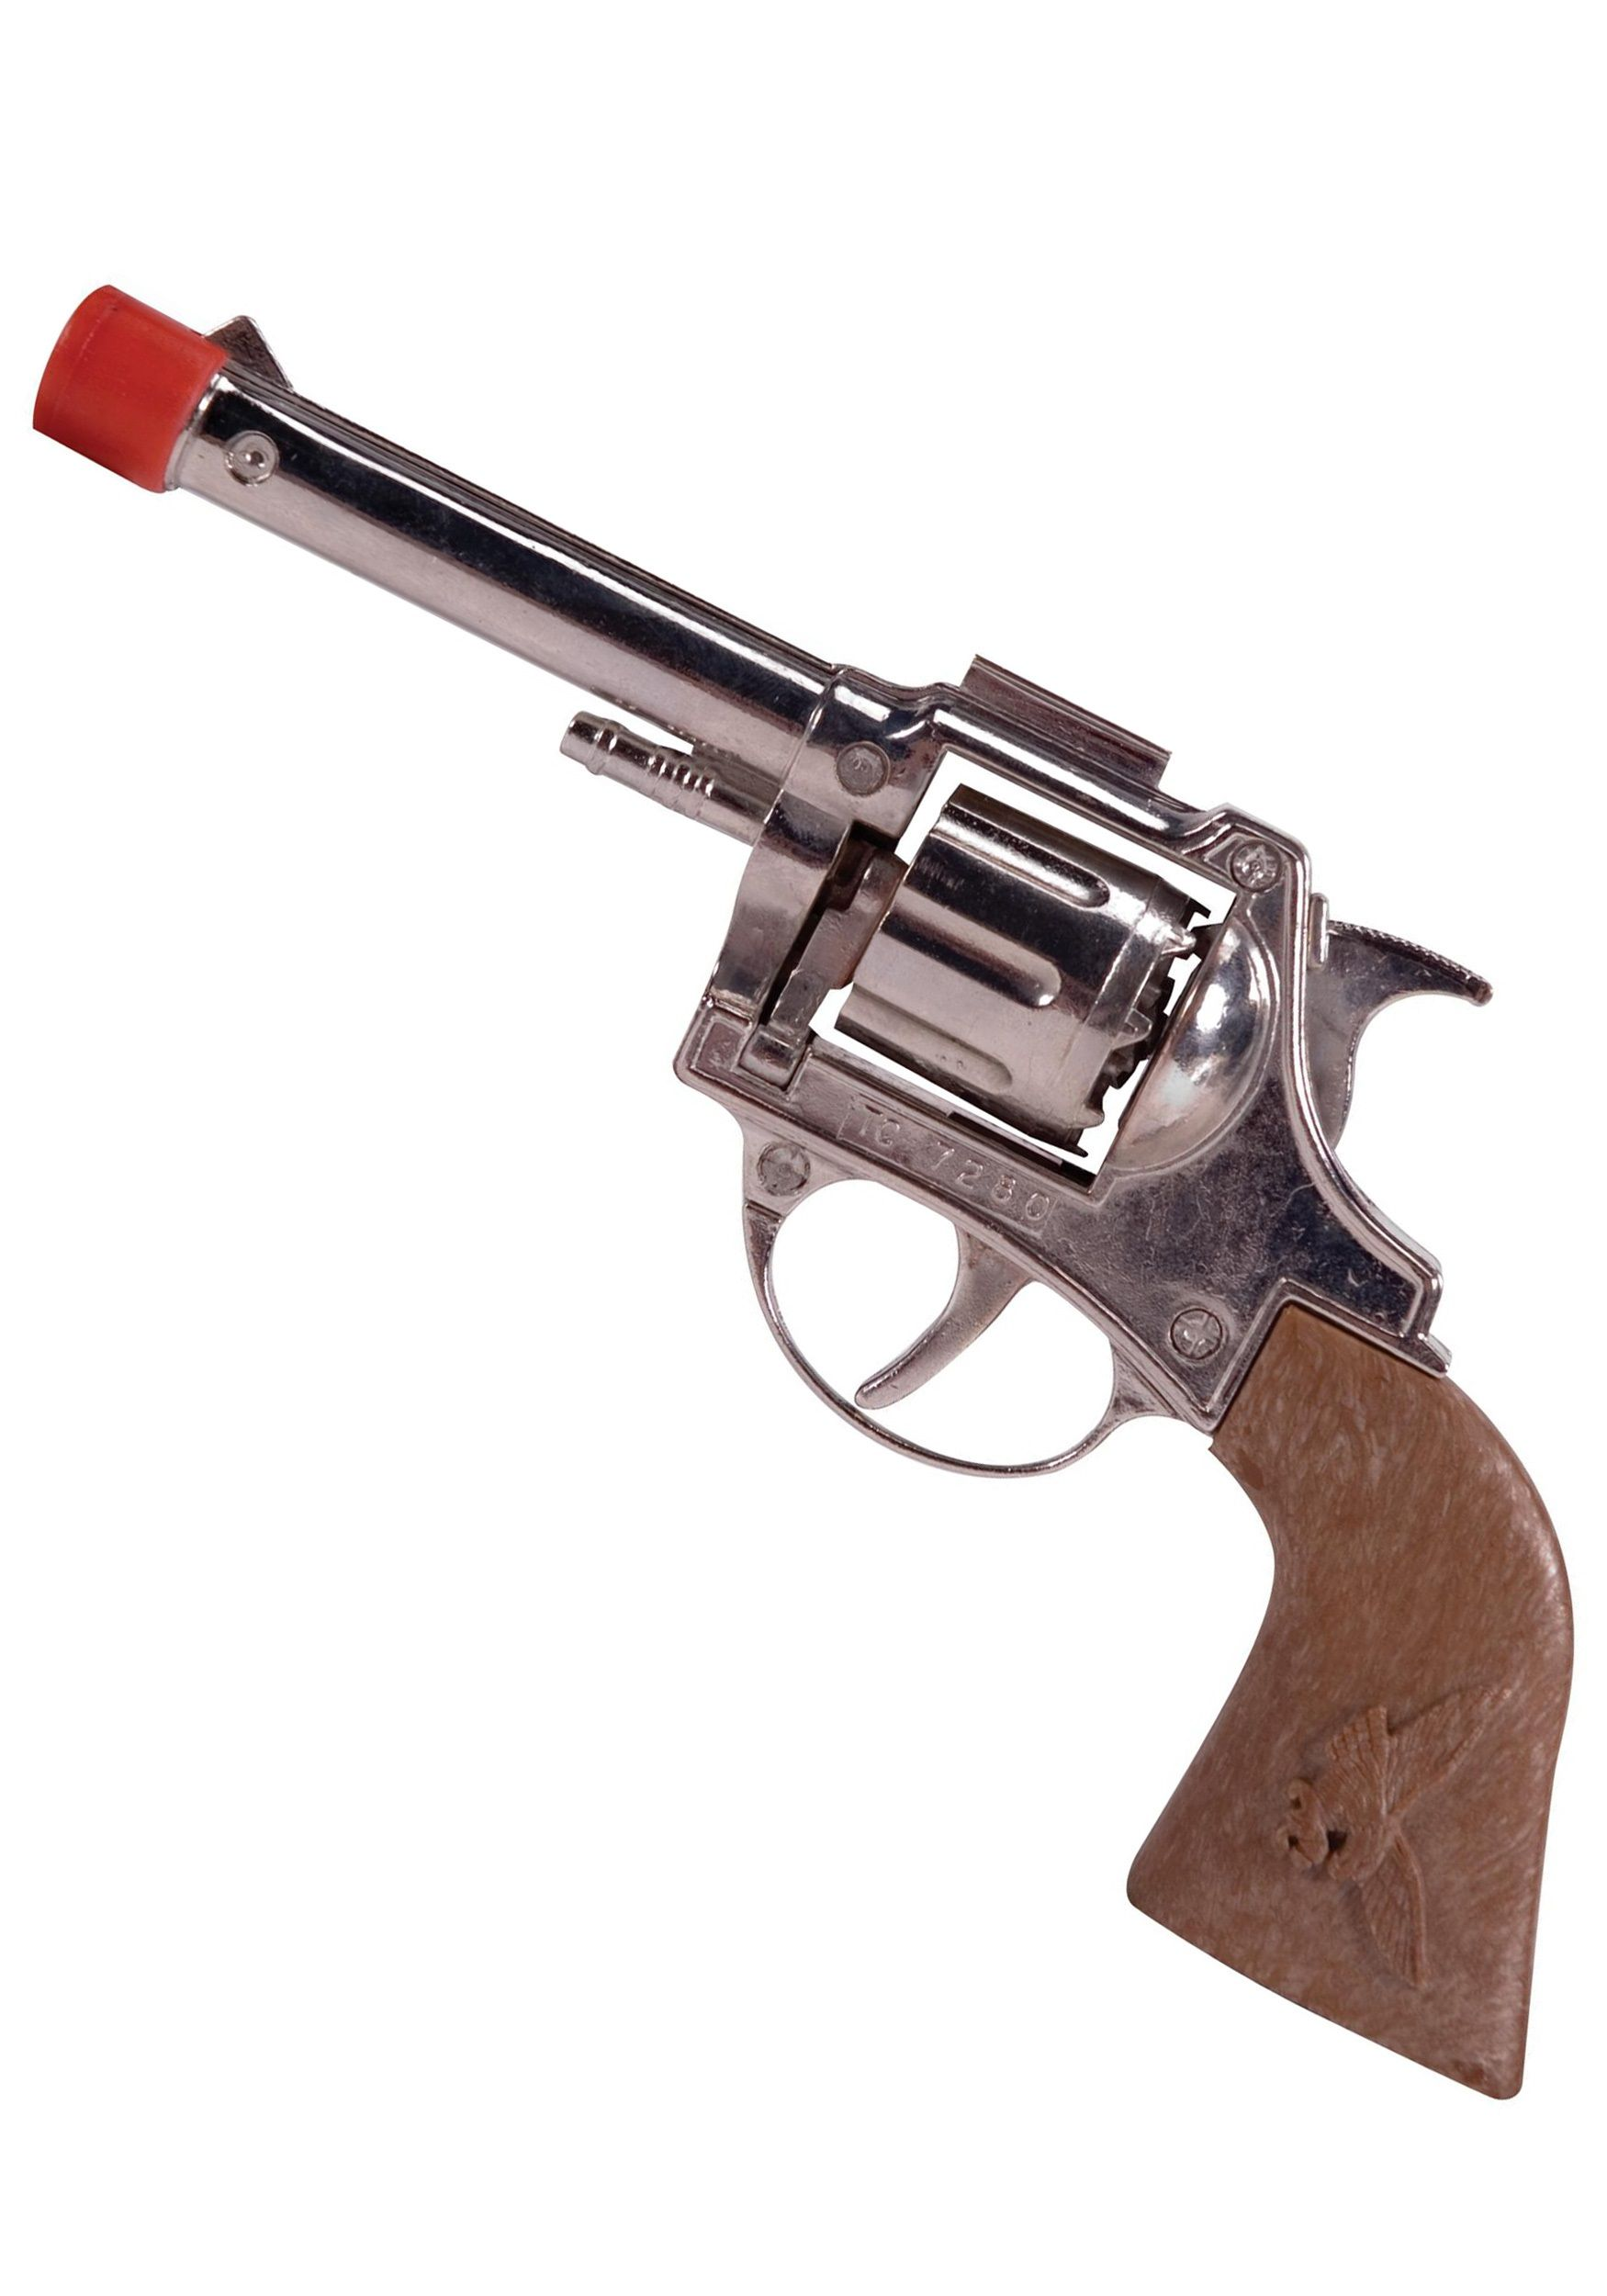 Double pistol handgun revolver gun display case cabinet rack shadowbox - Complete Your Cowboy Costume Or Police Officer Costume With This Die Cast Toy Cap Gun